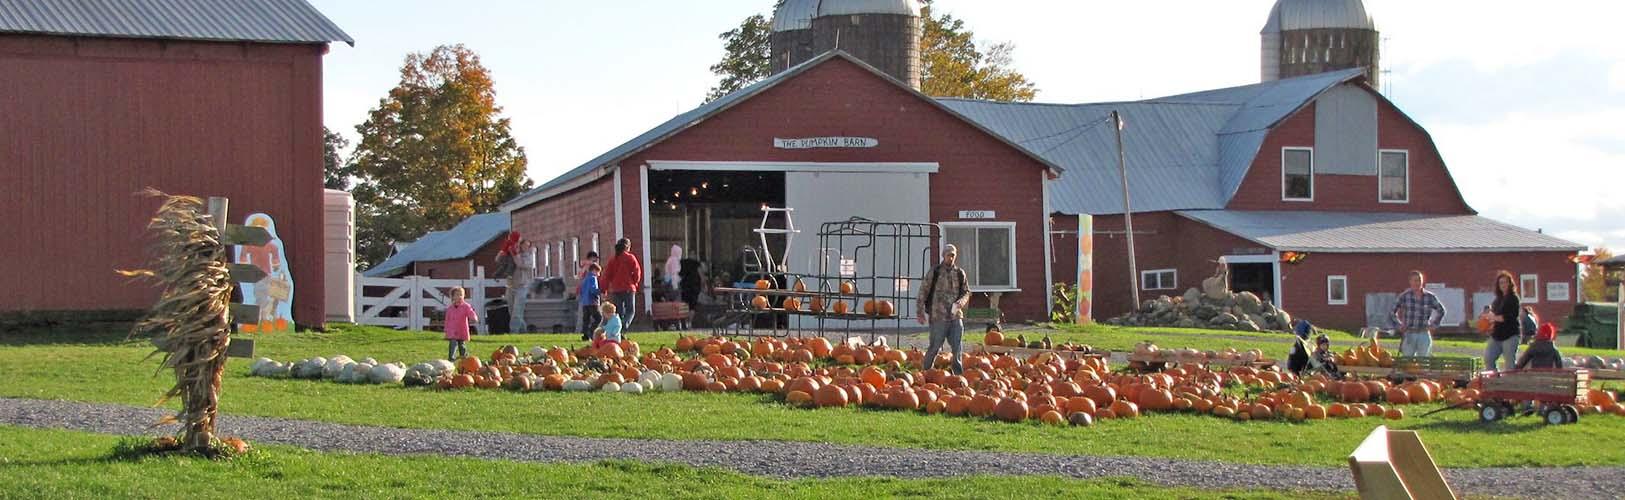 Pumpkin Patch at Ellms Family Farm